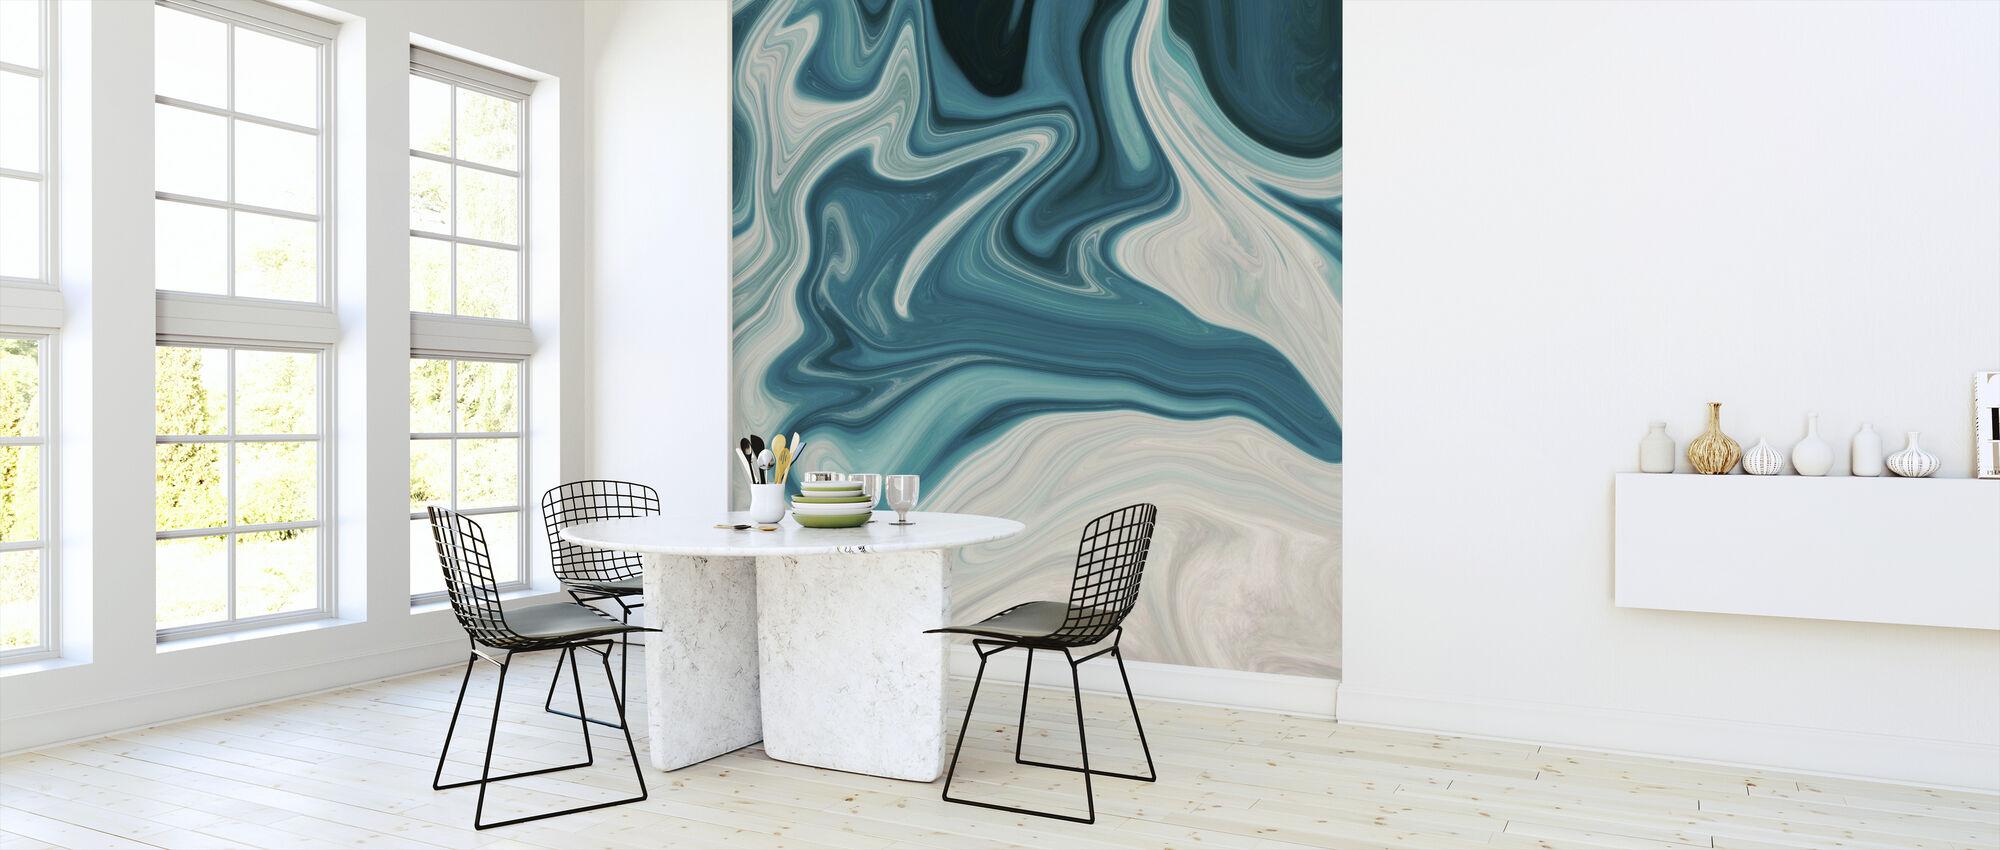 Sea of Marble - Wallpaper - Kitchen